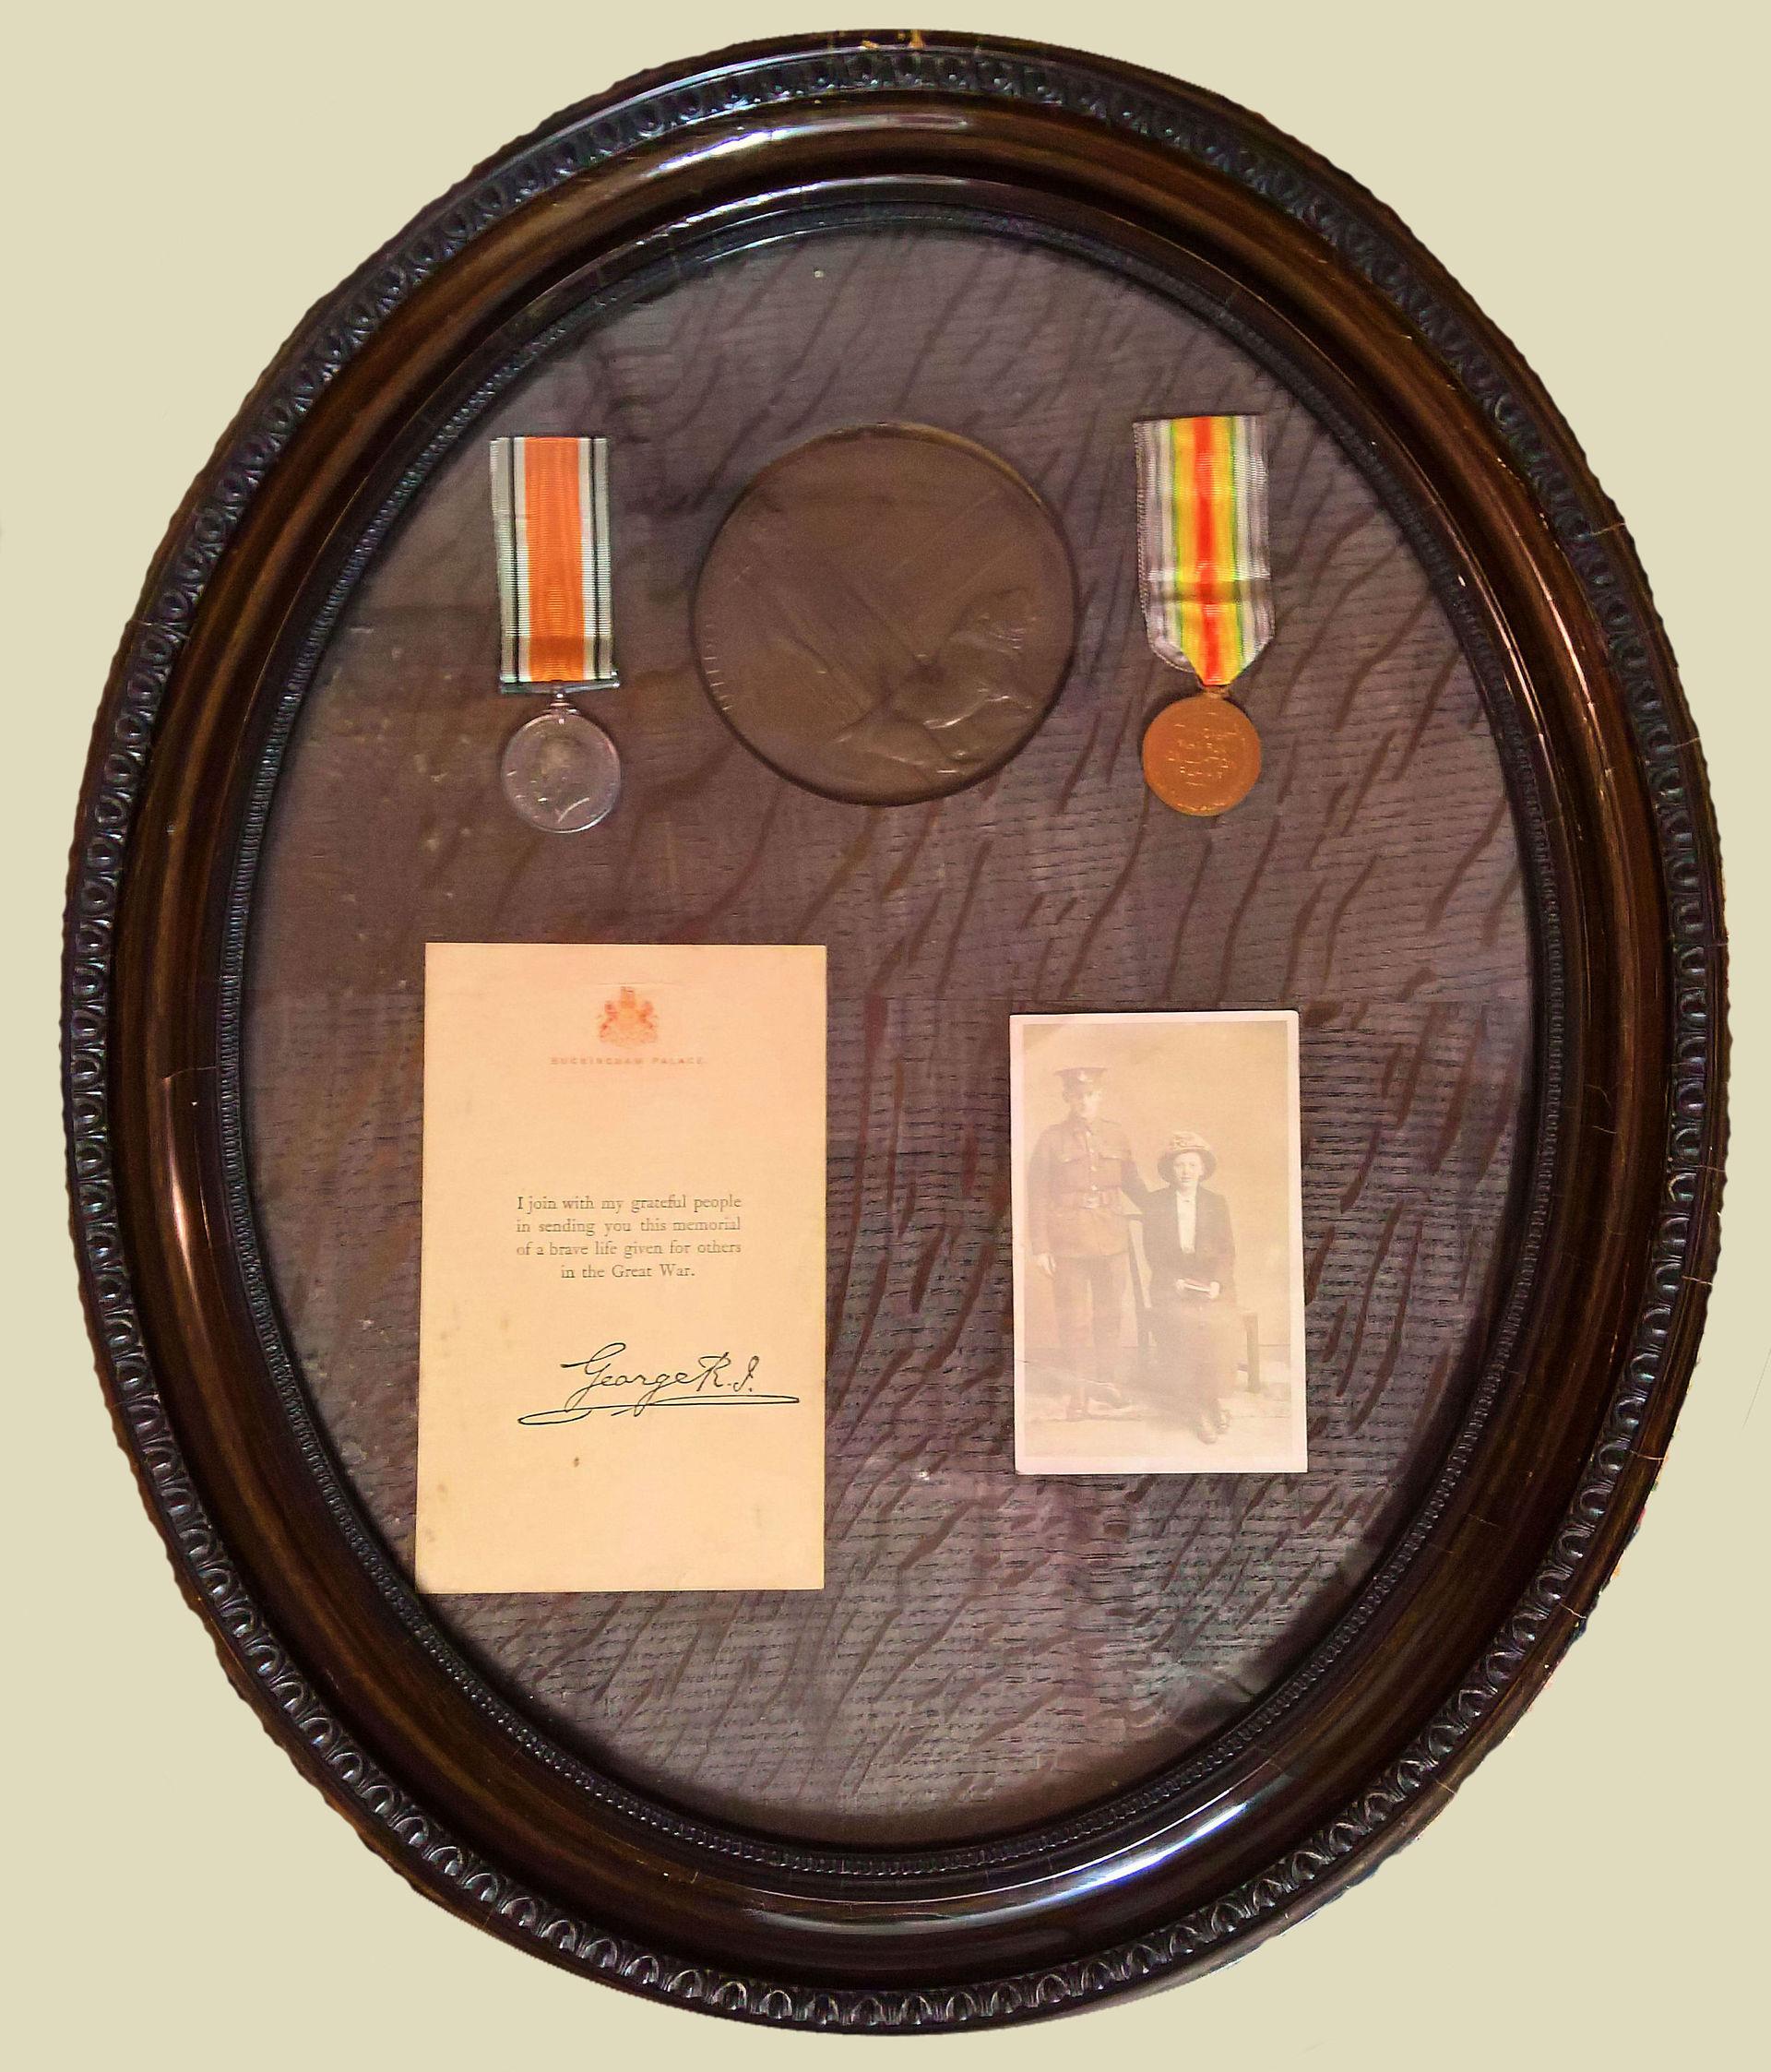 Harold Binks of West Burton, framed war memorabilia